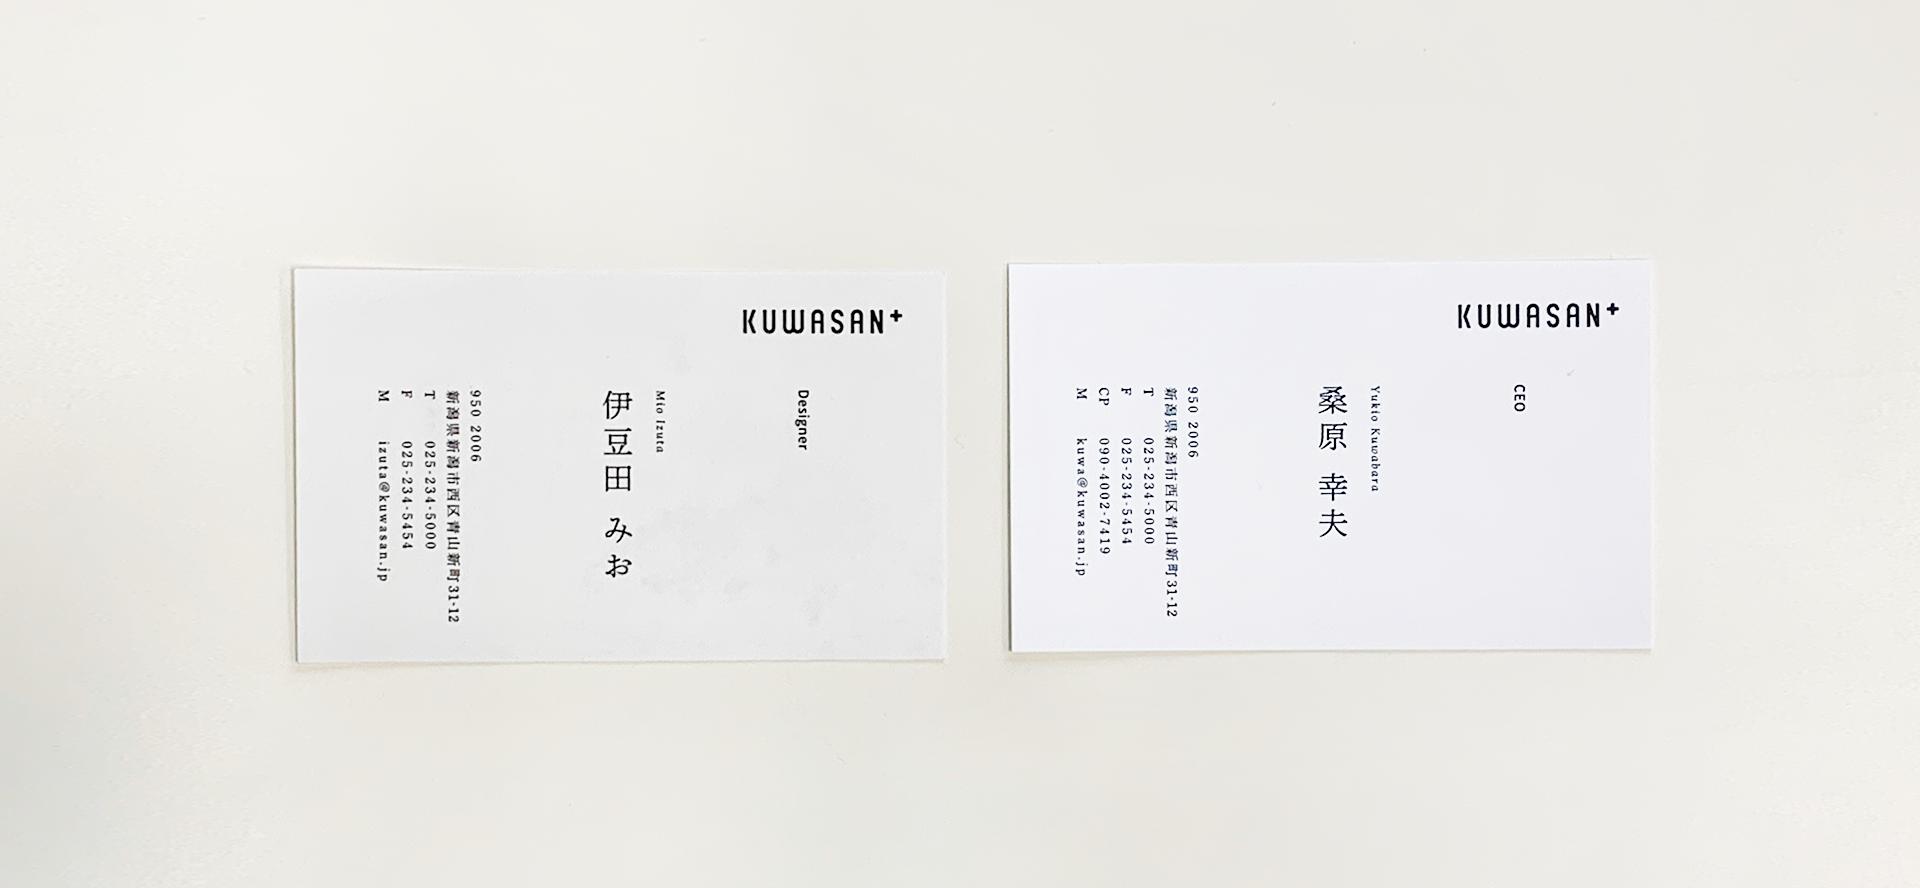 kuwasanplus businesscard